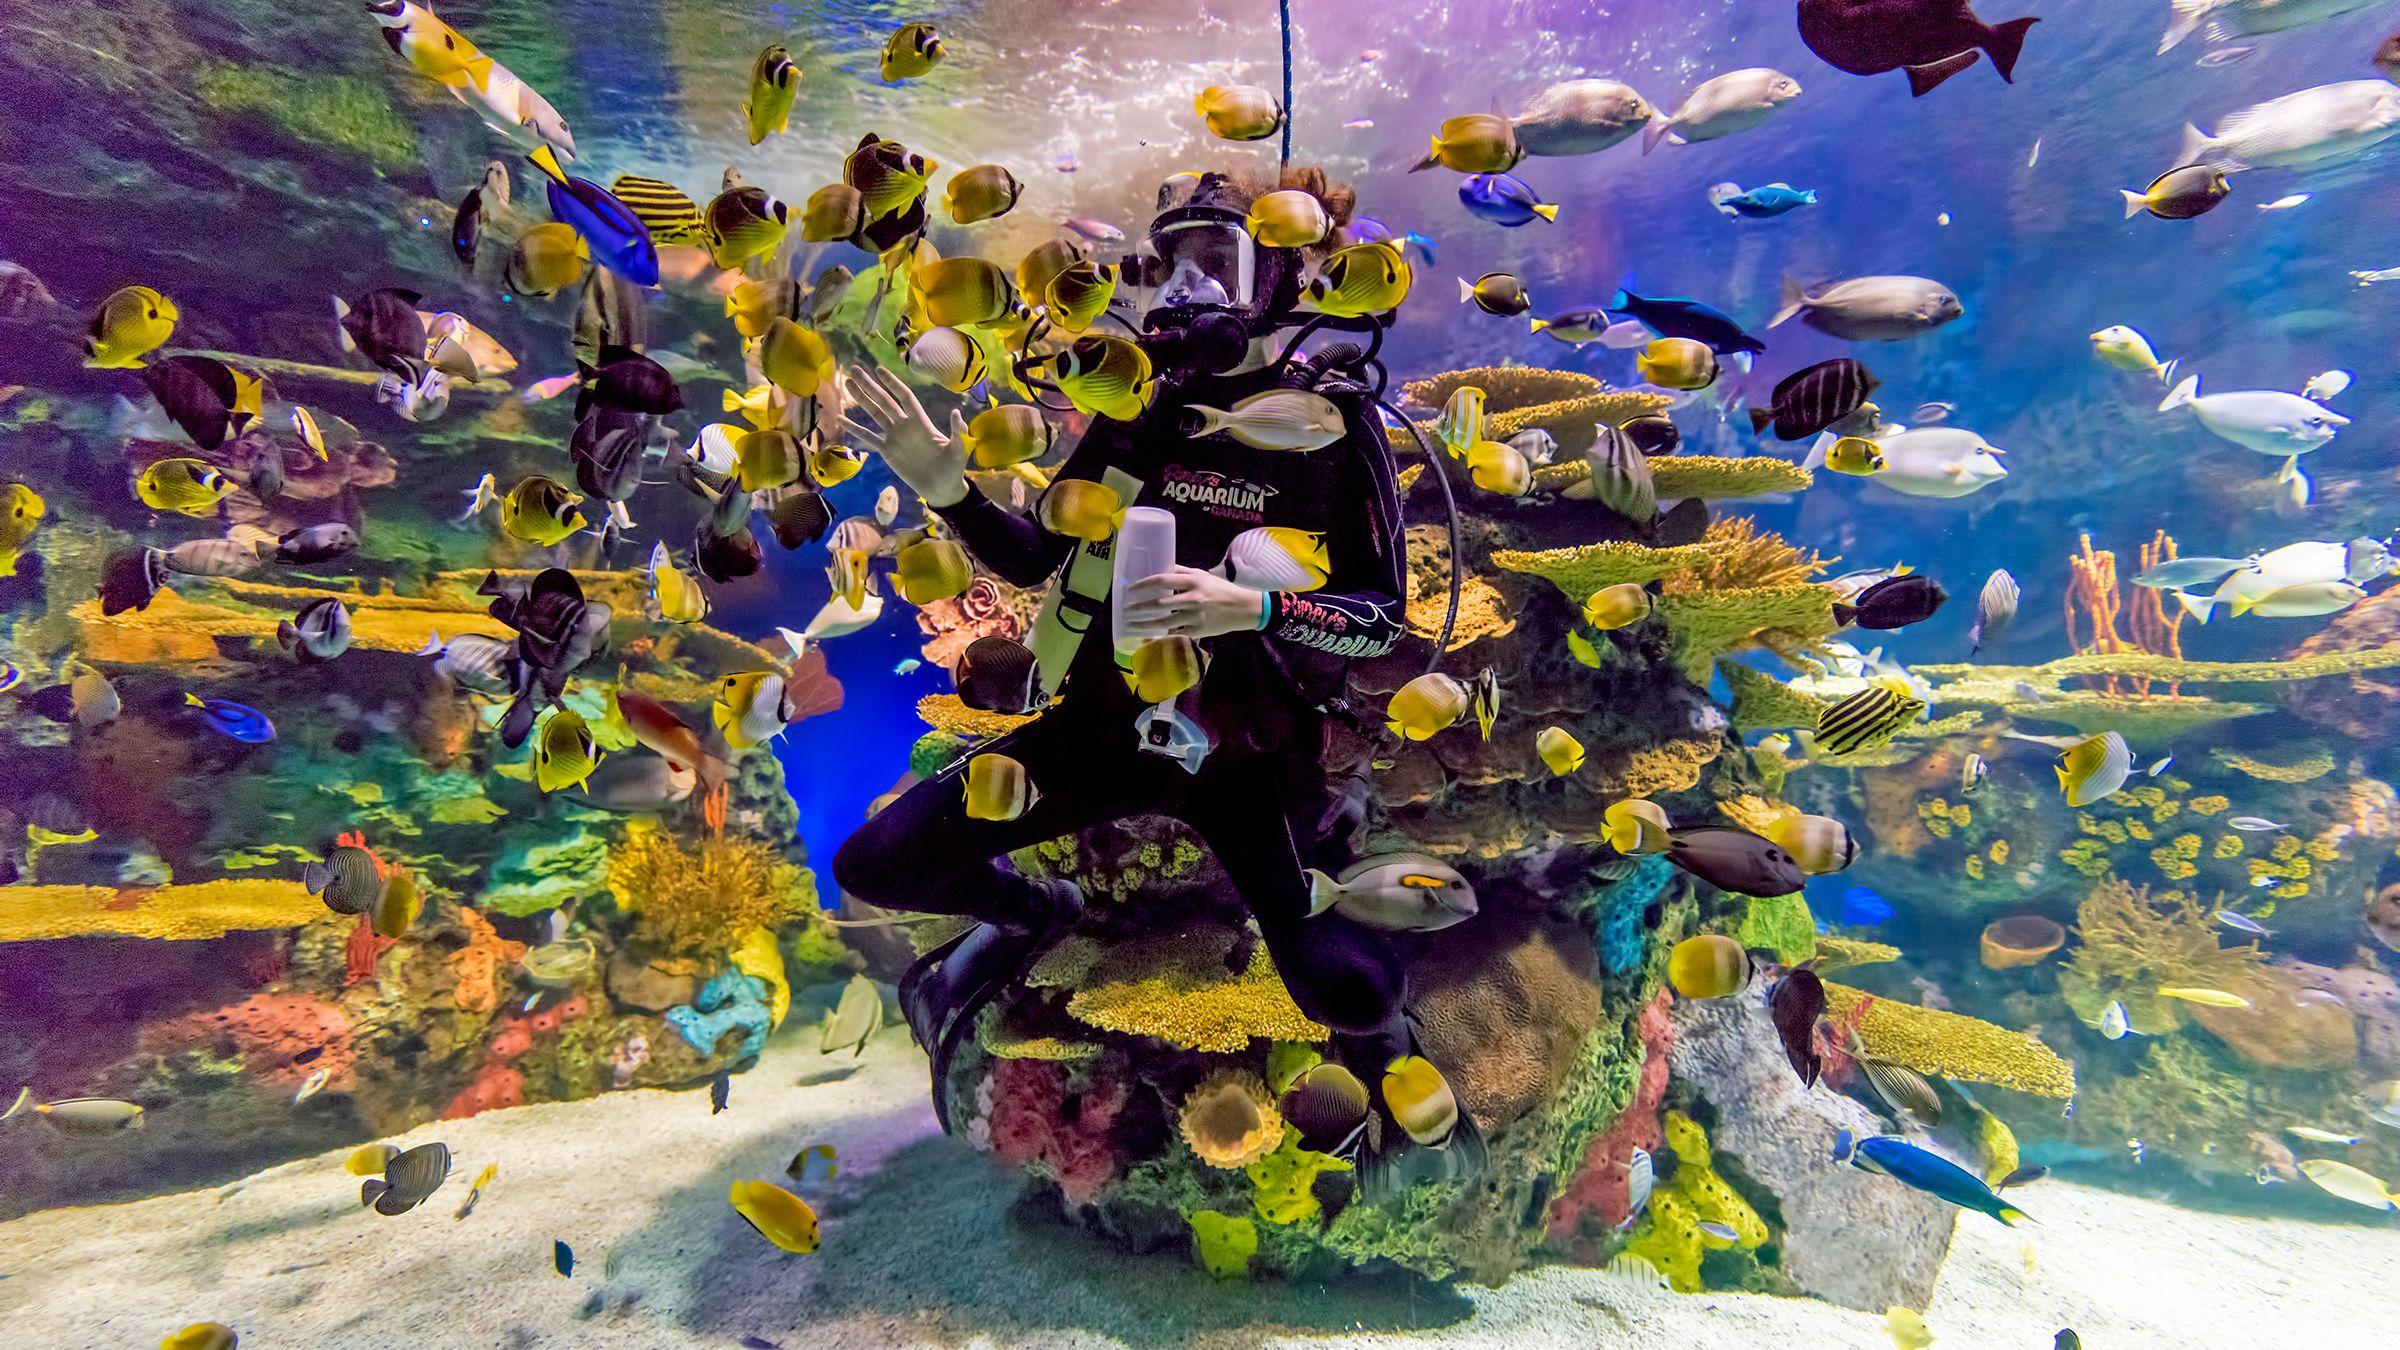 Ripley's Aquarium of Canada Admission Tickets